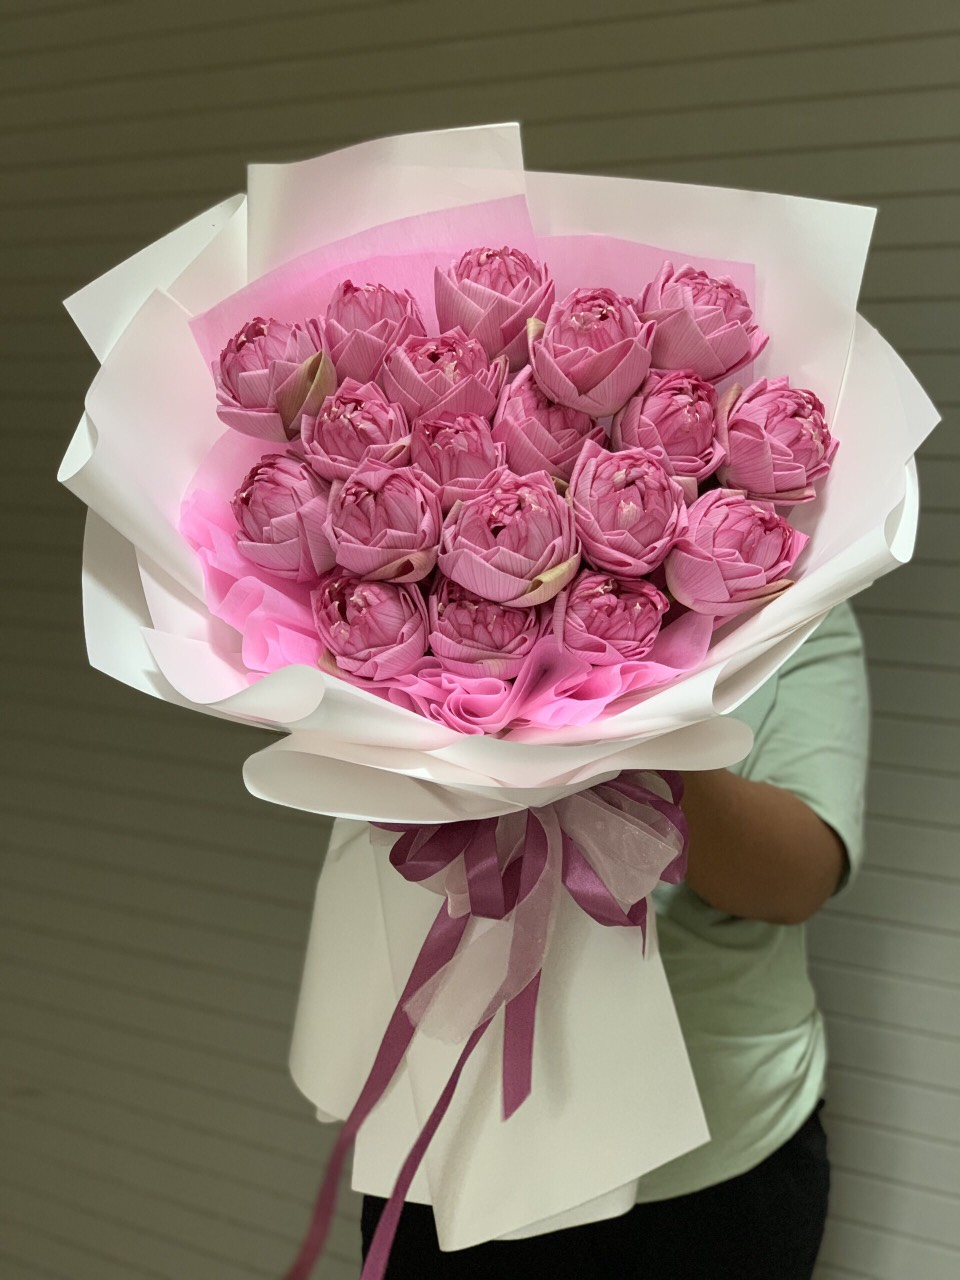 Bó hoa sen hồng 36